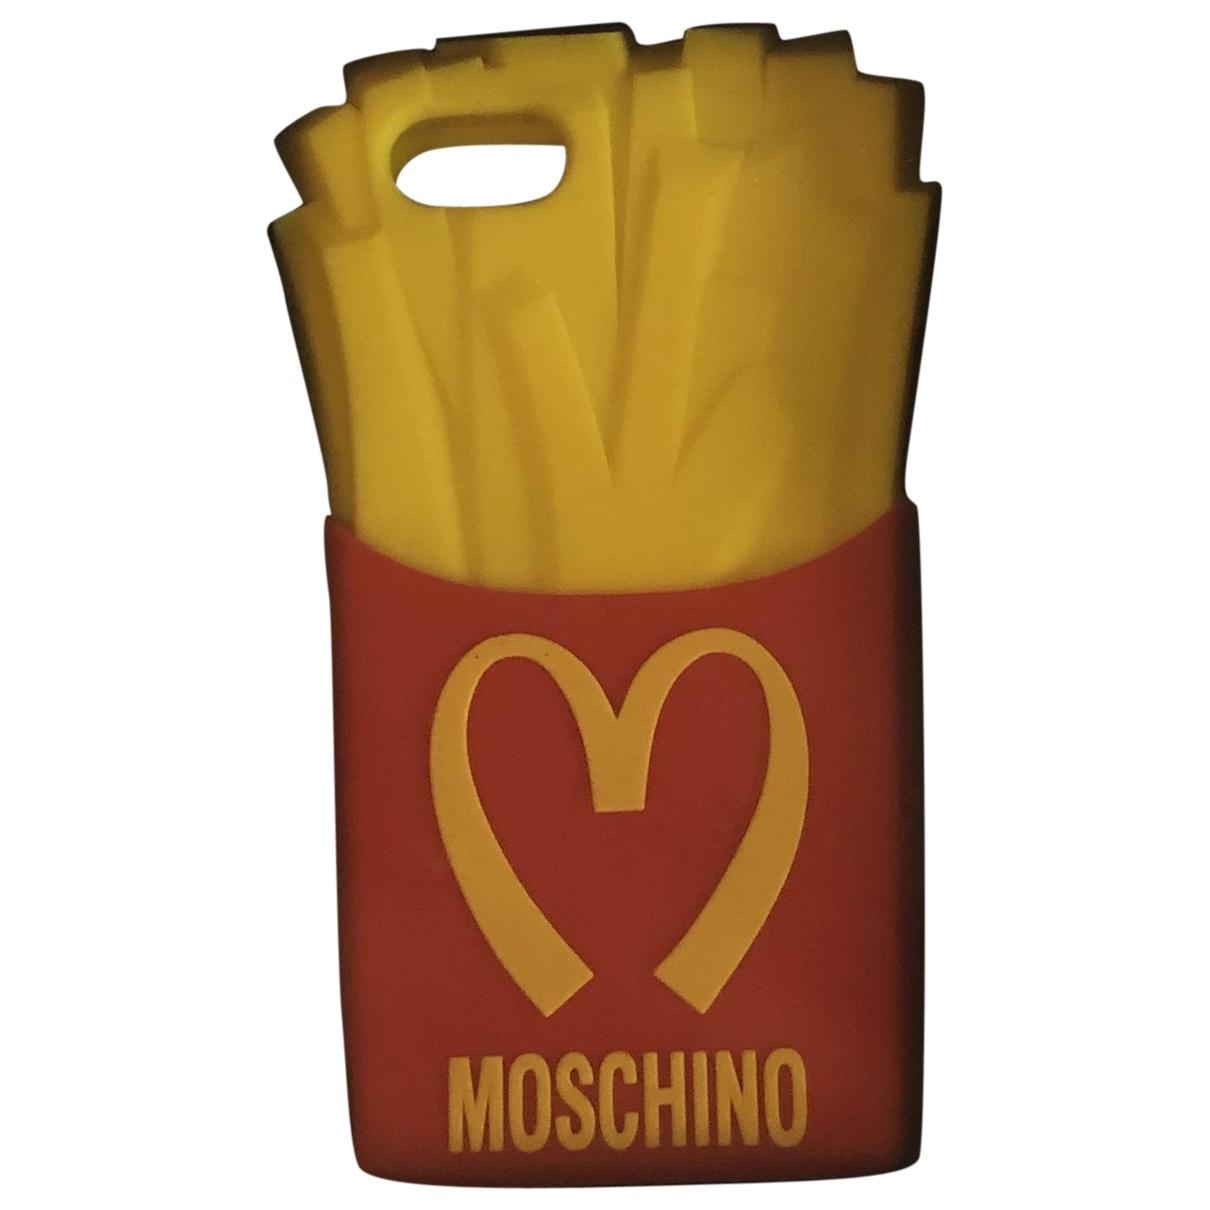 Moschino - Accessoires   pour lifestyle - jaune